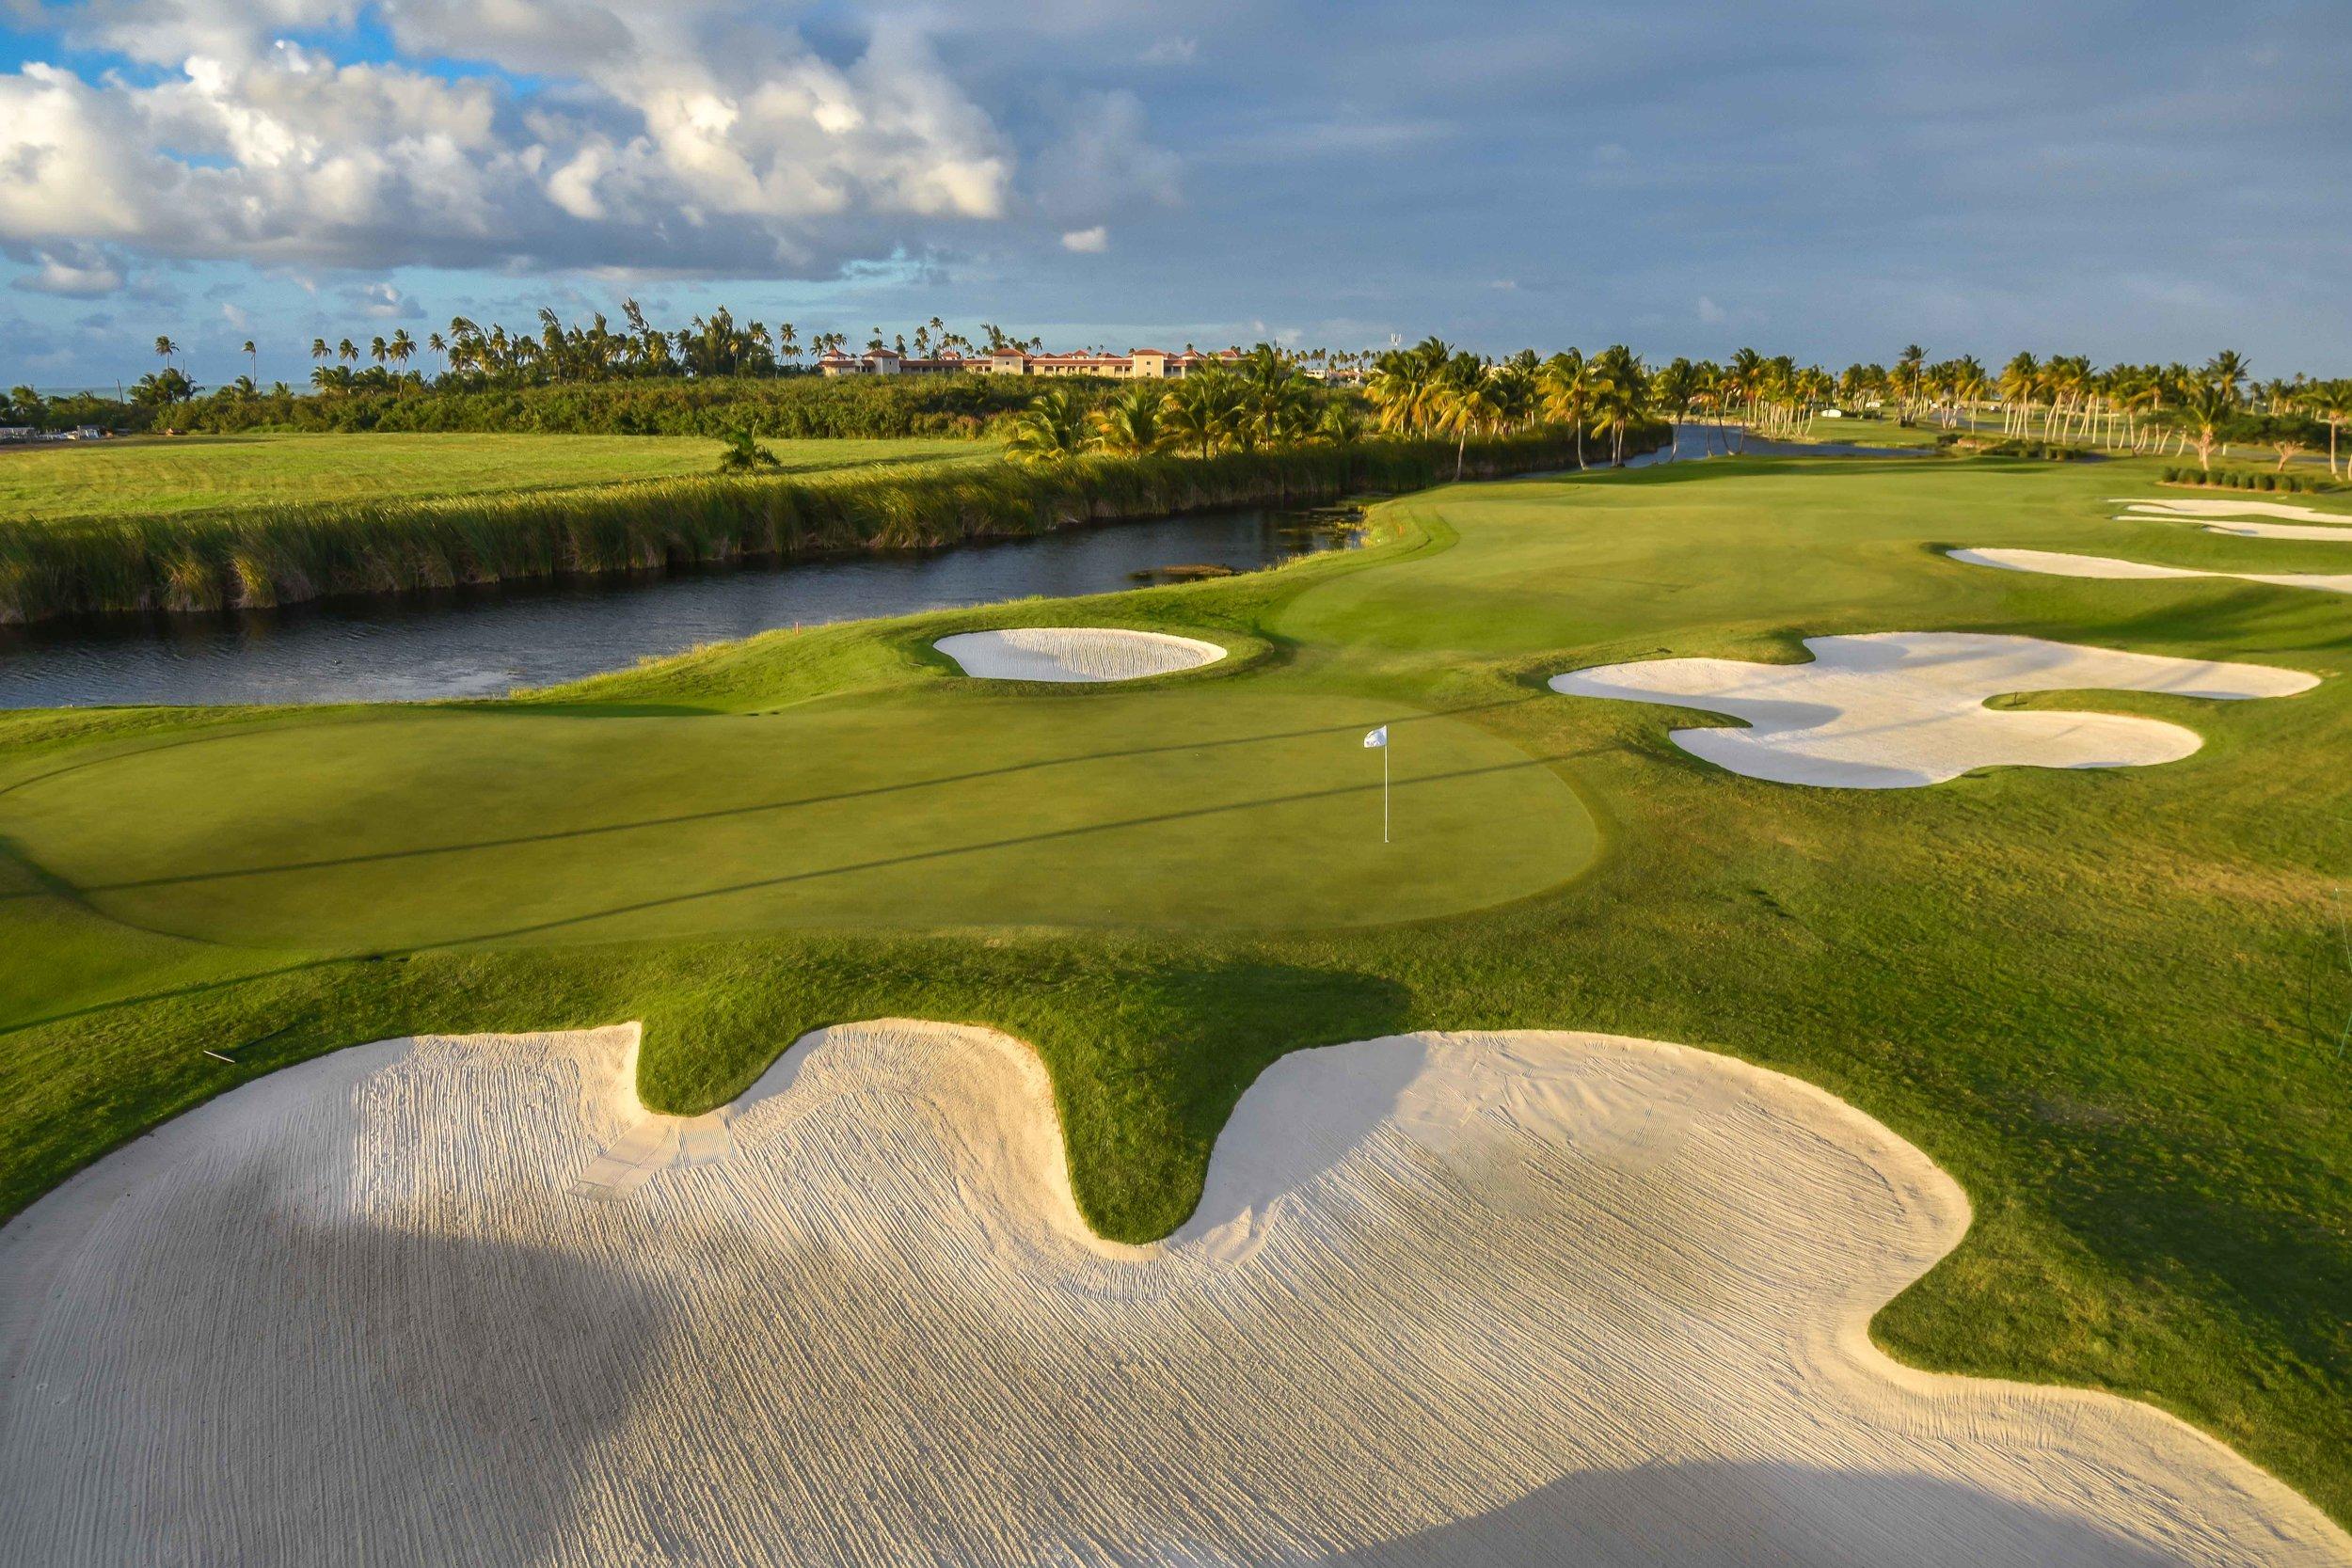 The 17th hole at Coco Beach Golf & Country Club